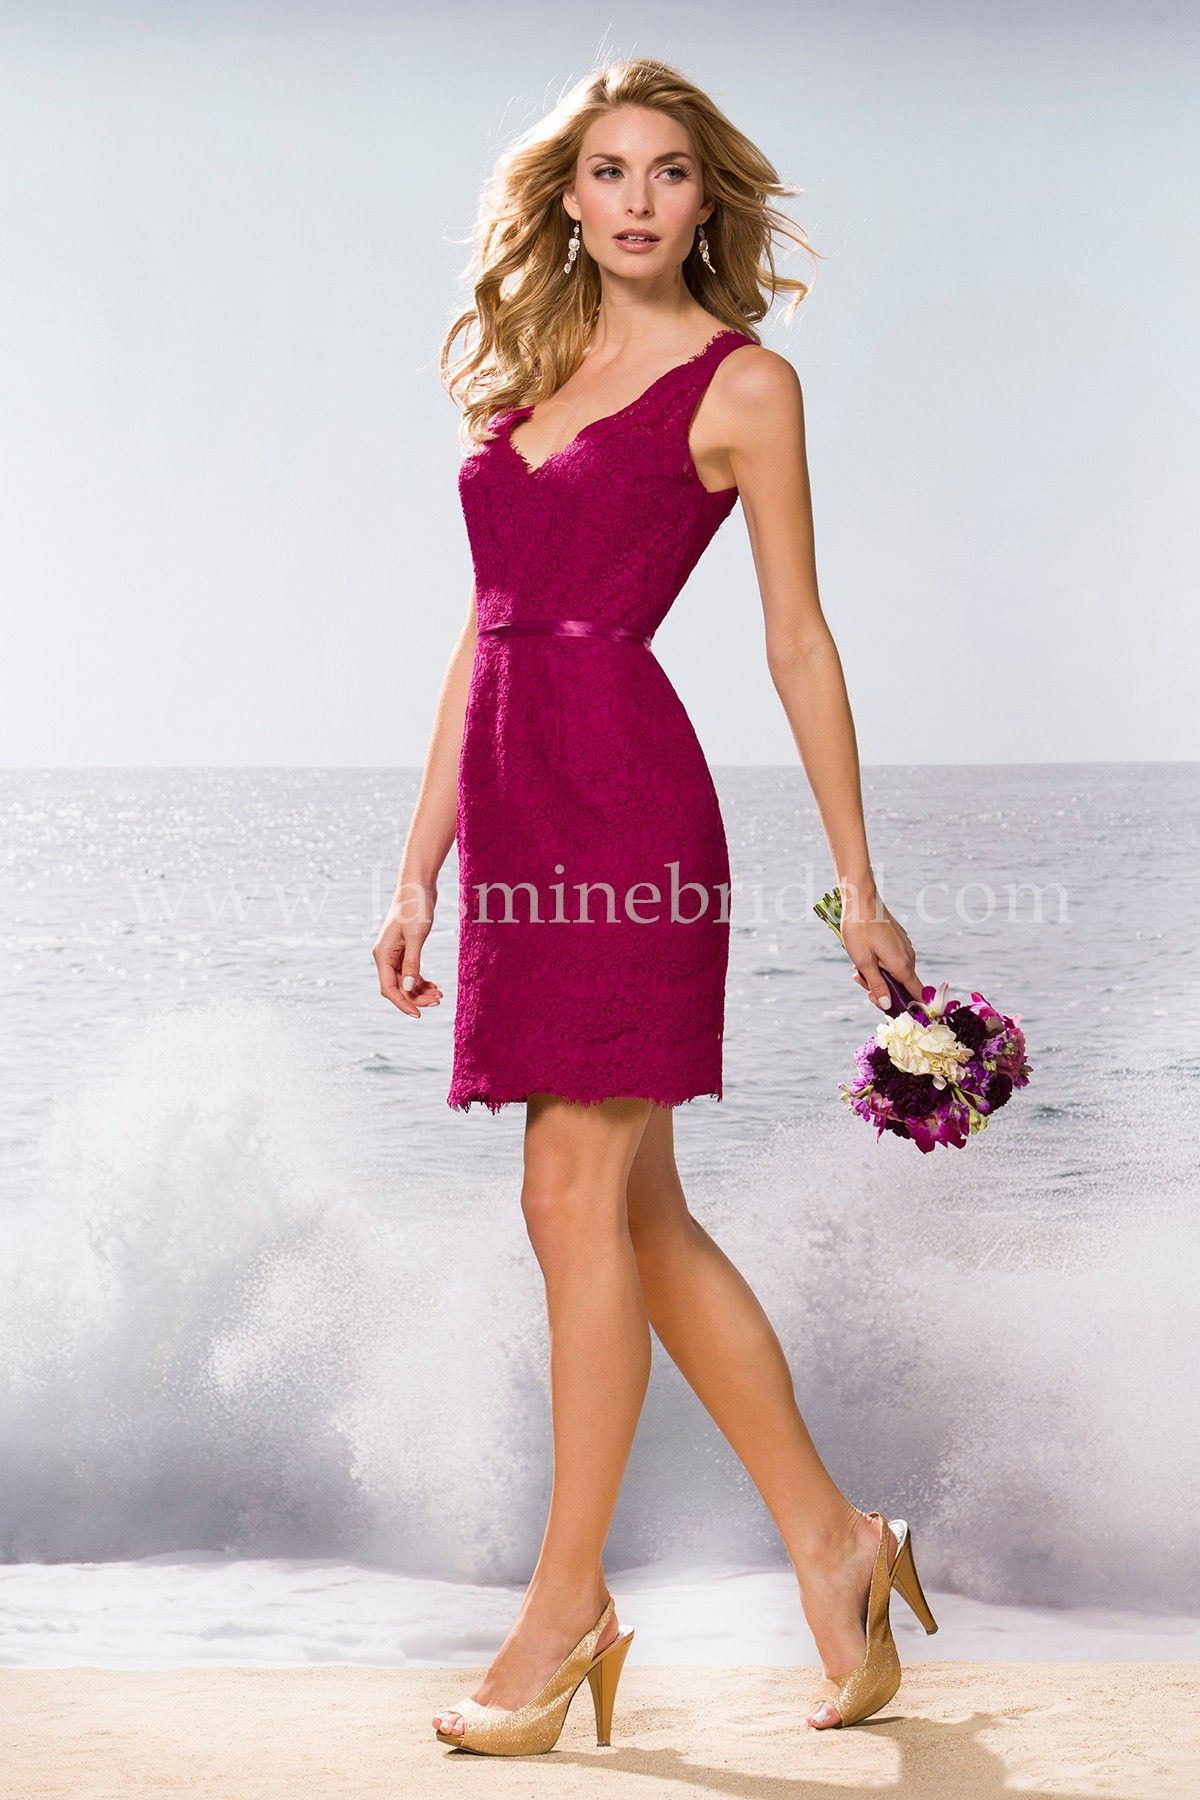 Jasmine bridal bridesmaid dress belsoie style l174068 in scarlet jasmine bridal bridesmaid dress belsoie style l174068 in scarlet alluring and glamorous this ombrellifo Images